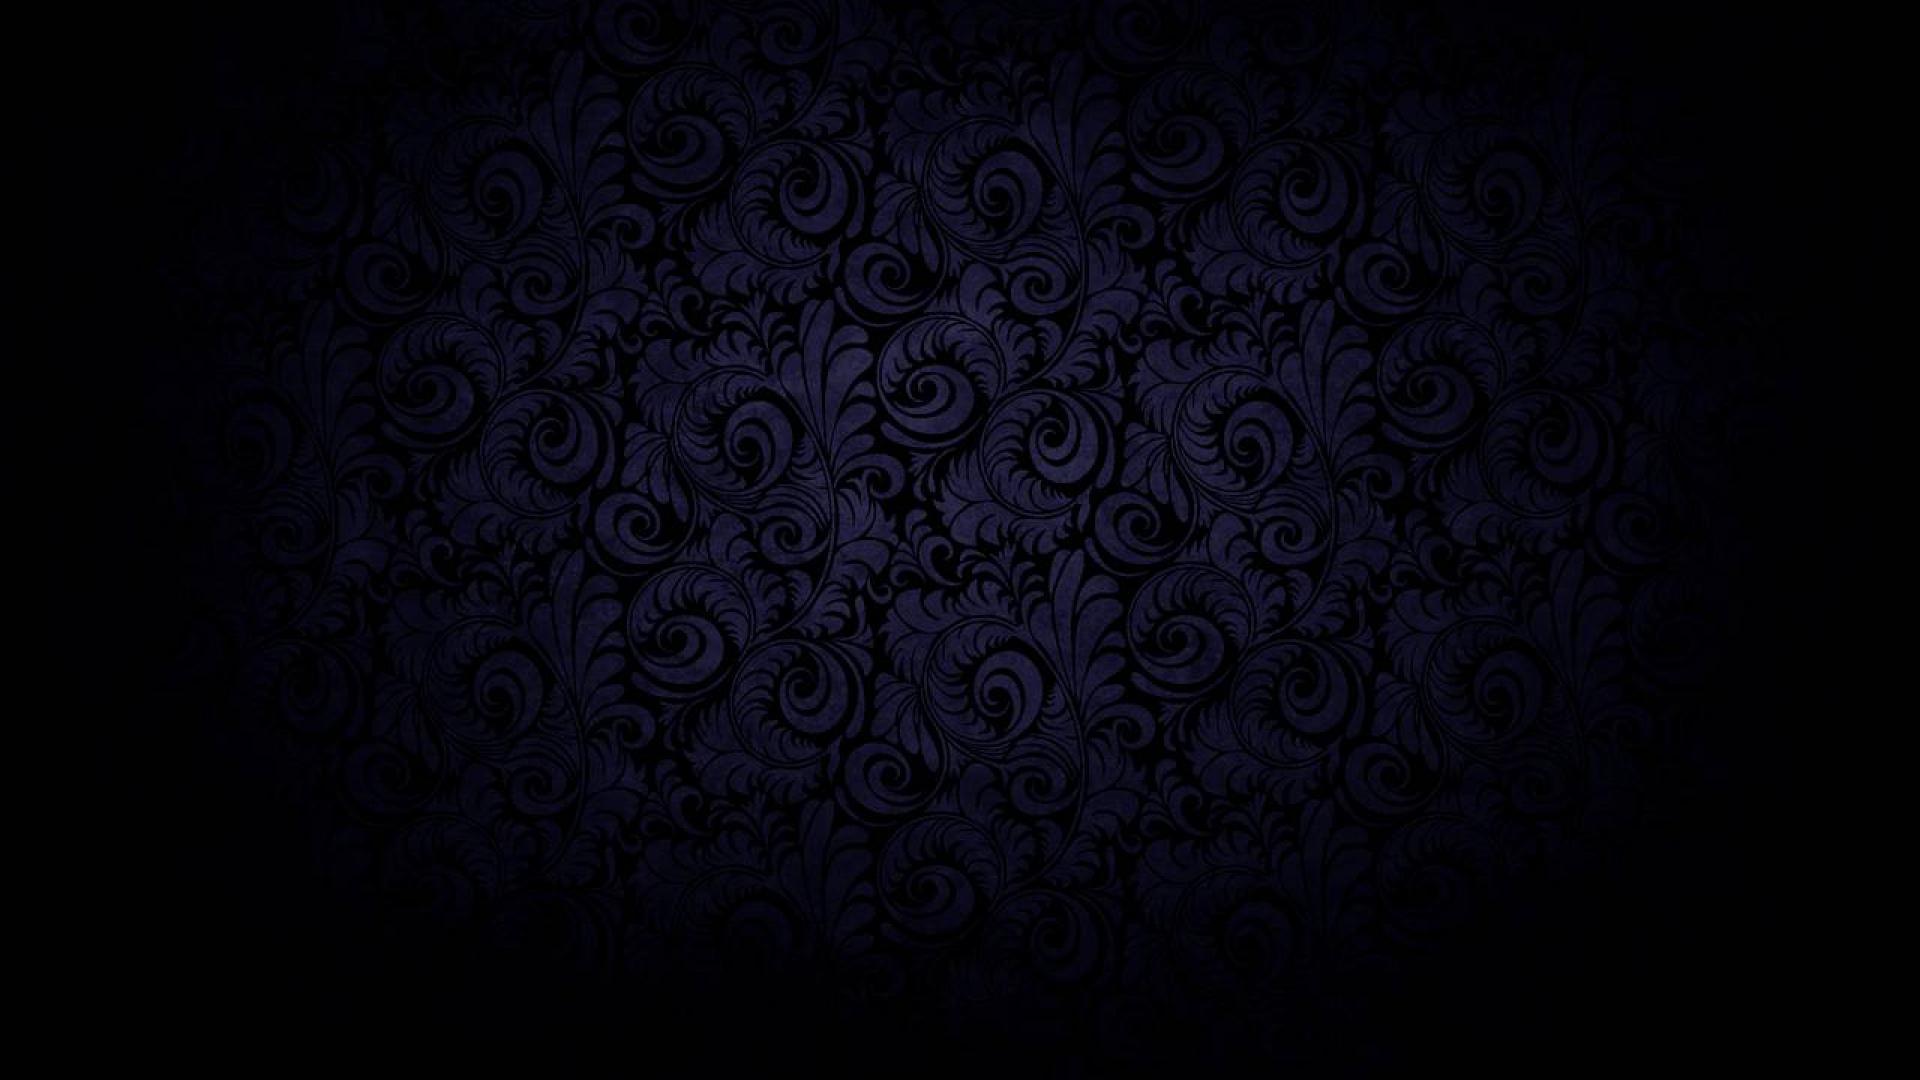 download 1920x1080 blue black - photo #11